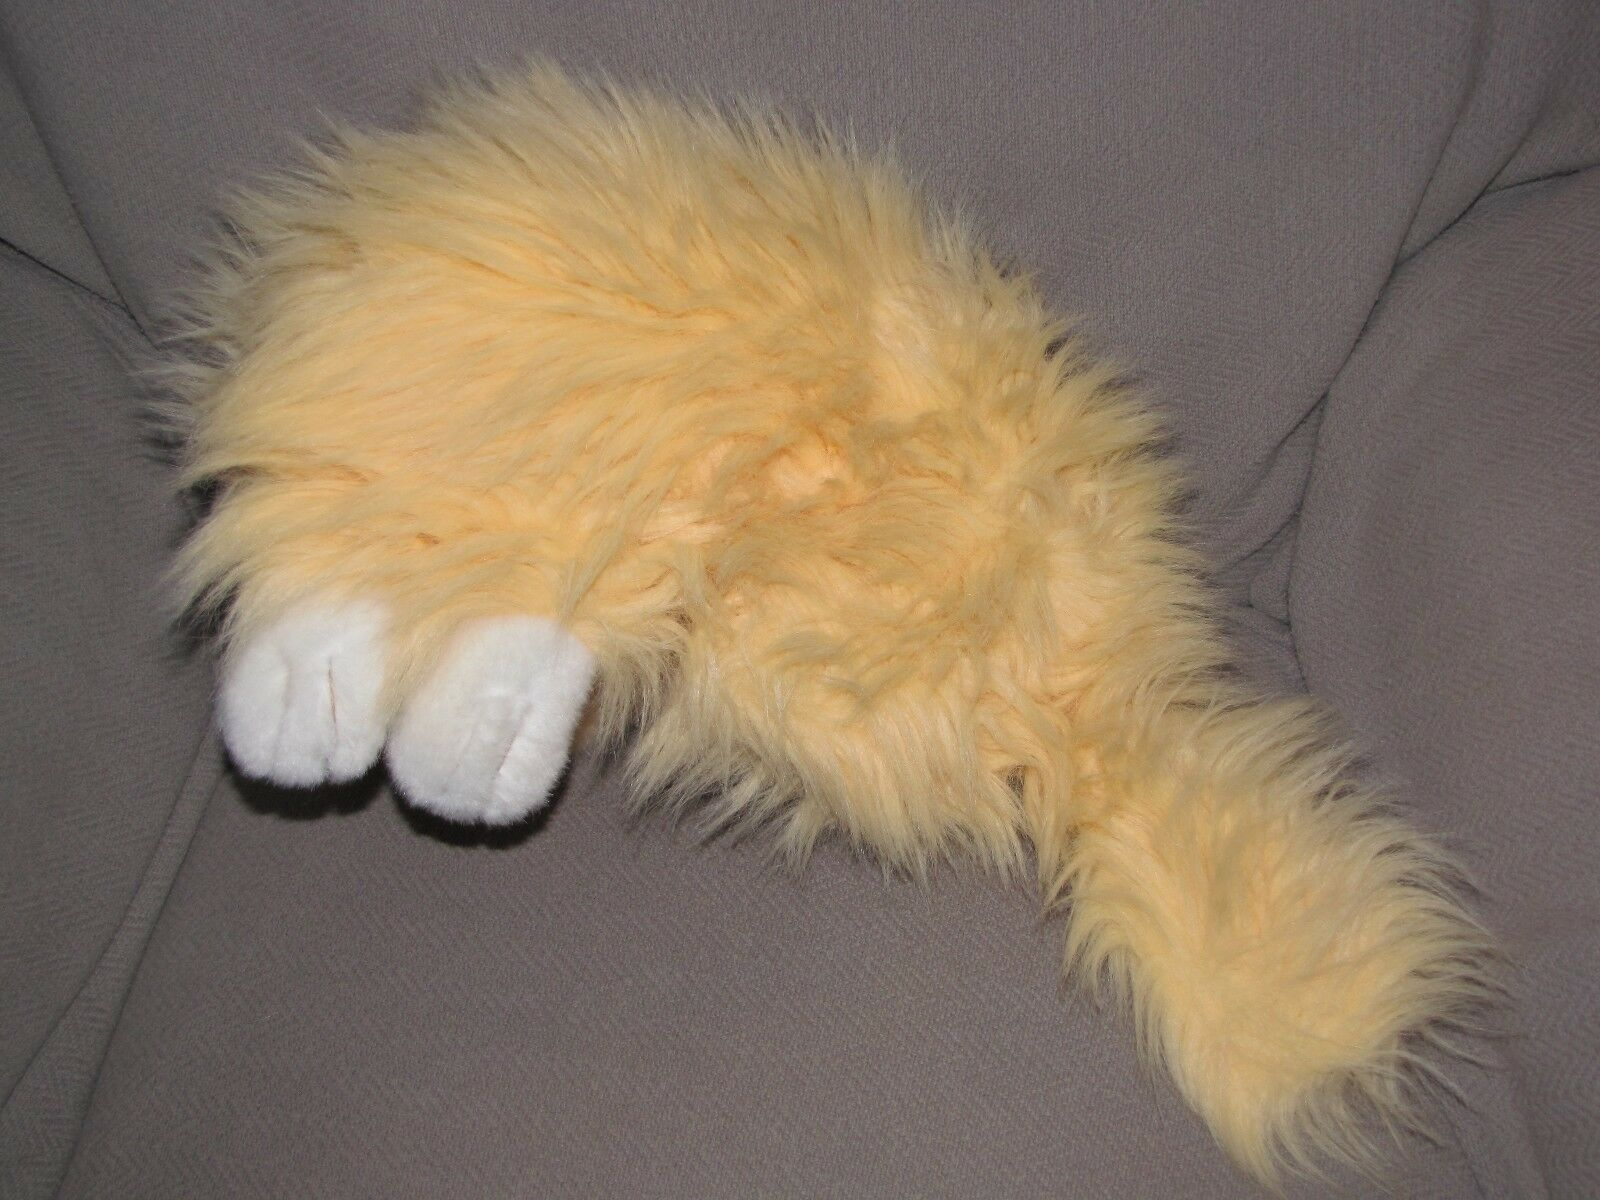 WALMART WAL MART STUFFED STUFFED STUFFED PLUSH KITTY CAT KITTEN BIG FLUFFY PERSIAN Orange PEACH bab720